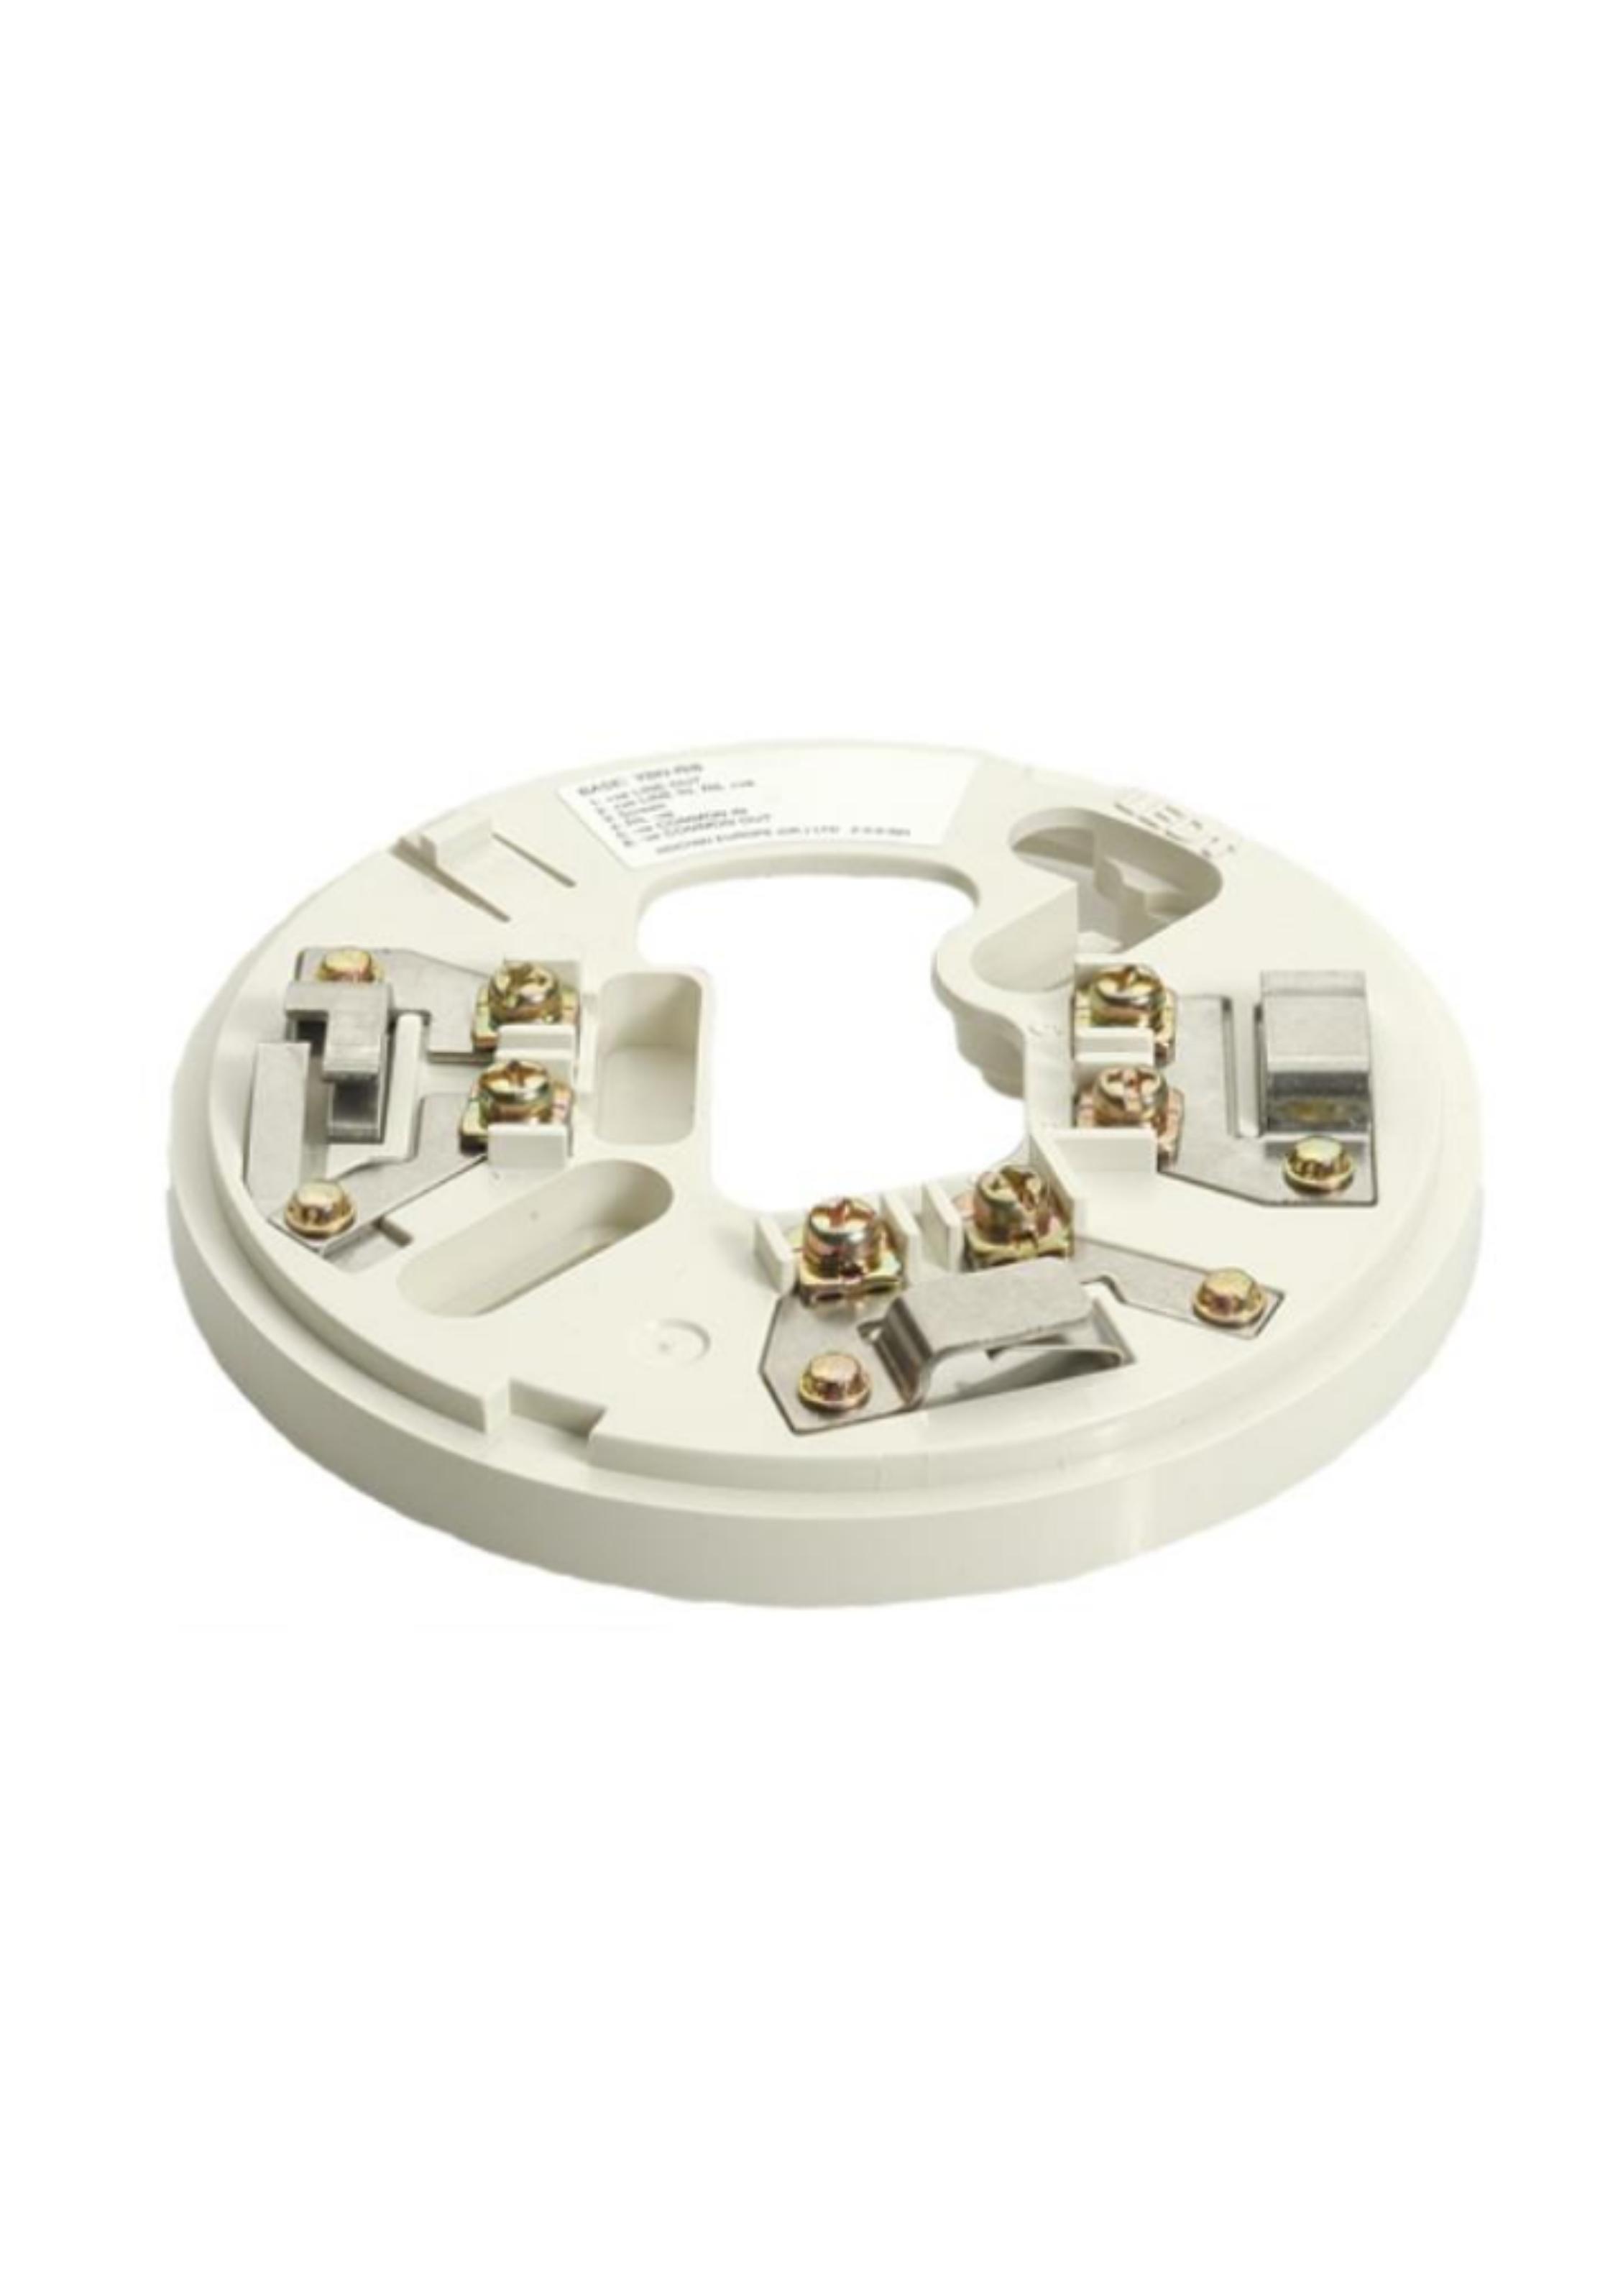 Flame Detector Universal Mounting Bracket 16706210...